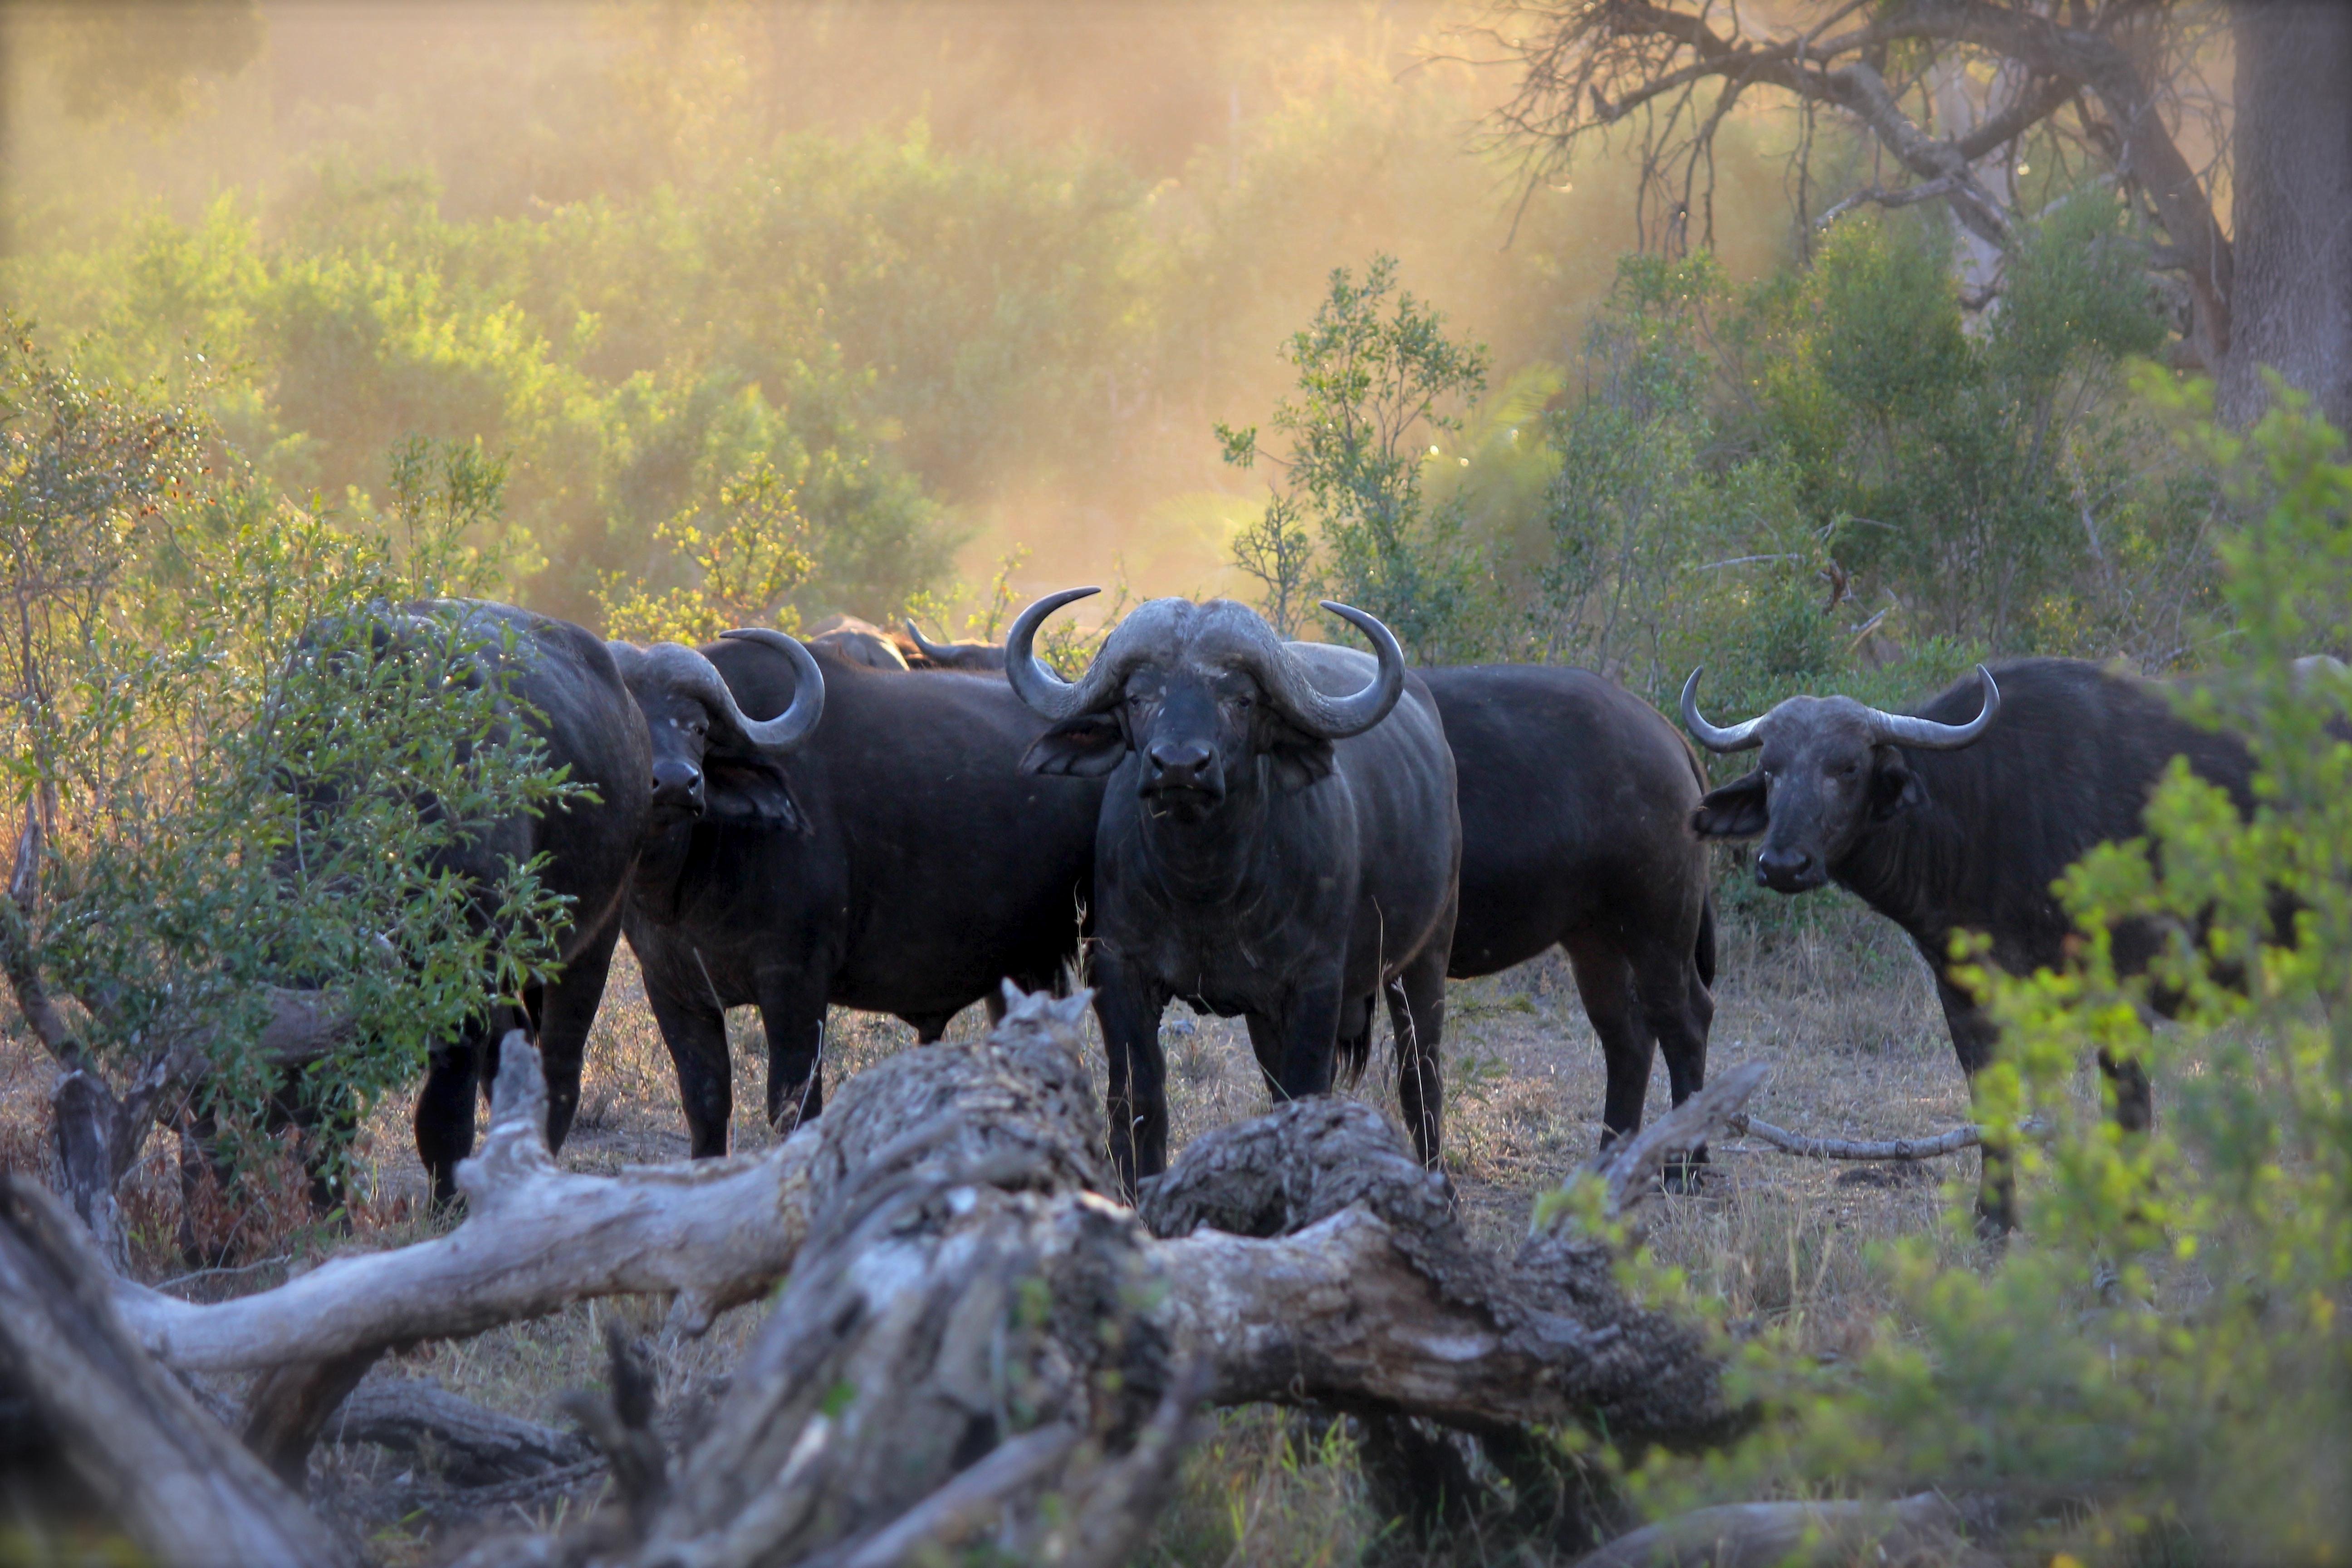 Herd of black water buffaloes photo